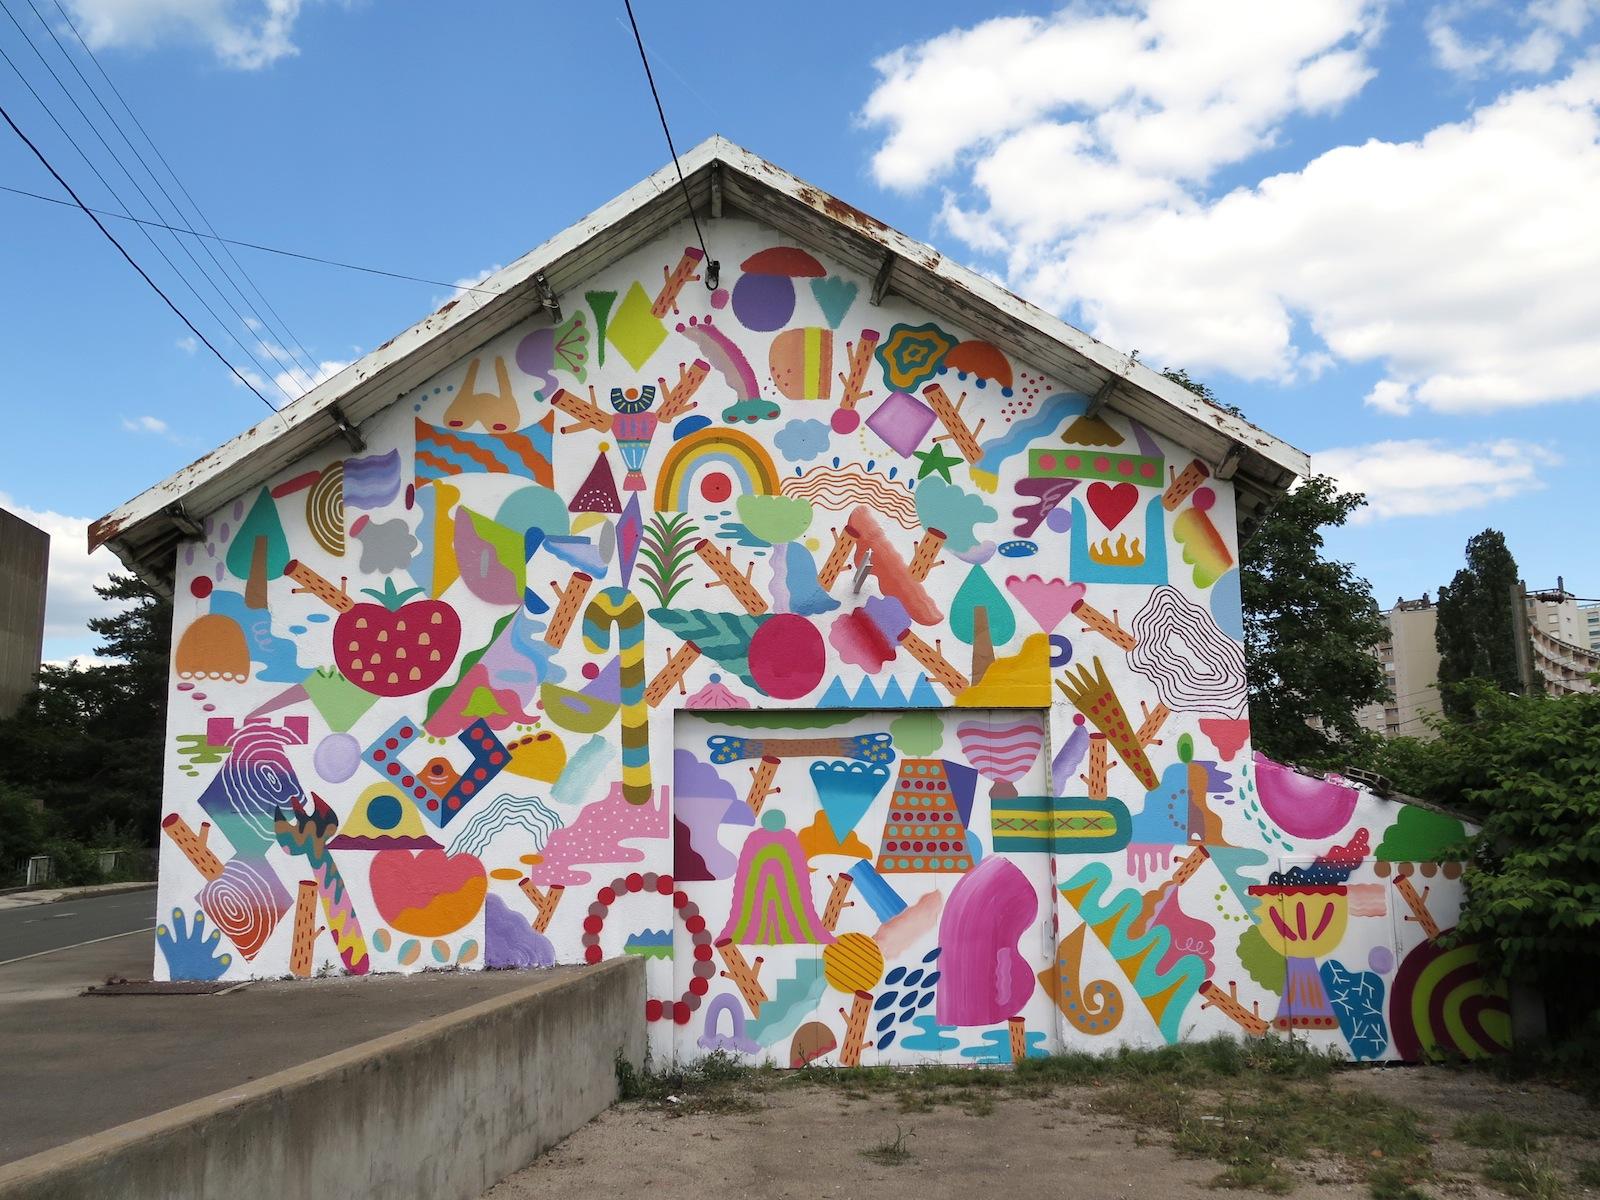 zosen-mina-hamada-at-bien-urbain-2014-09